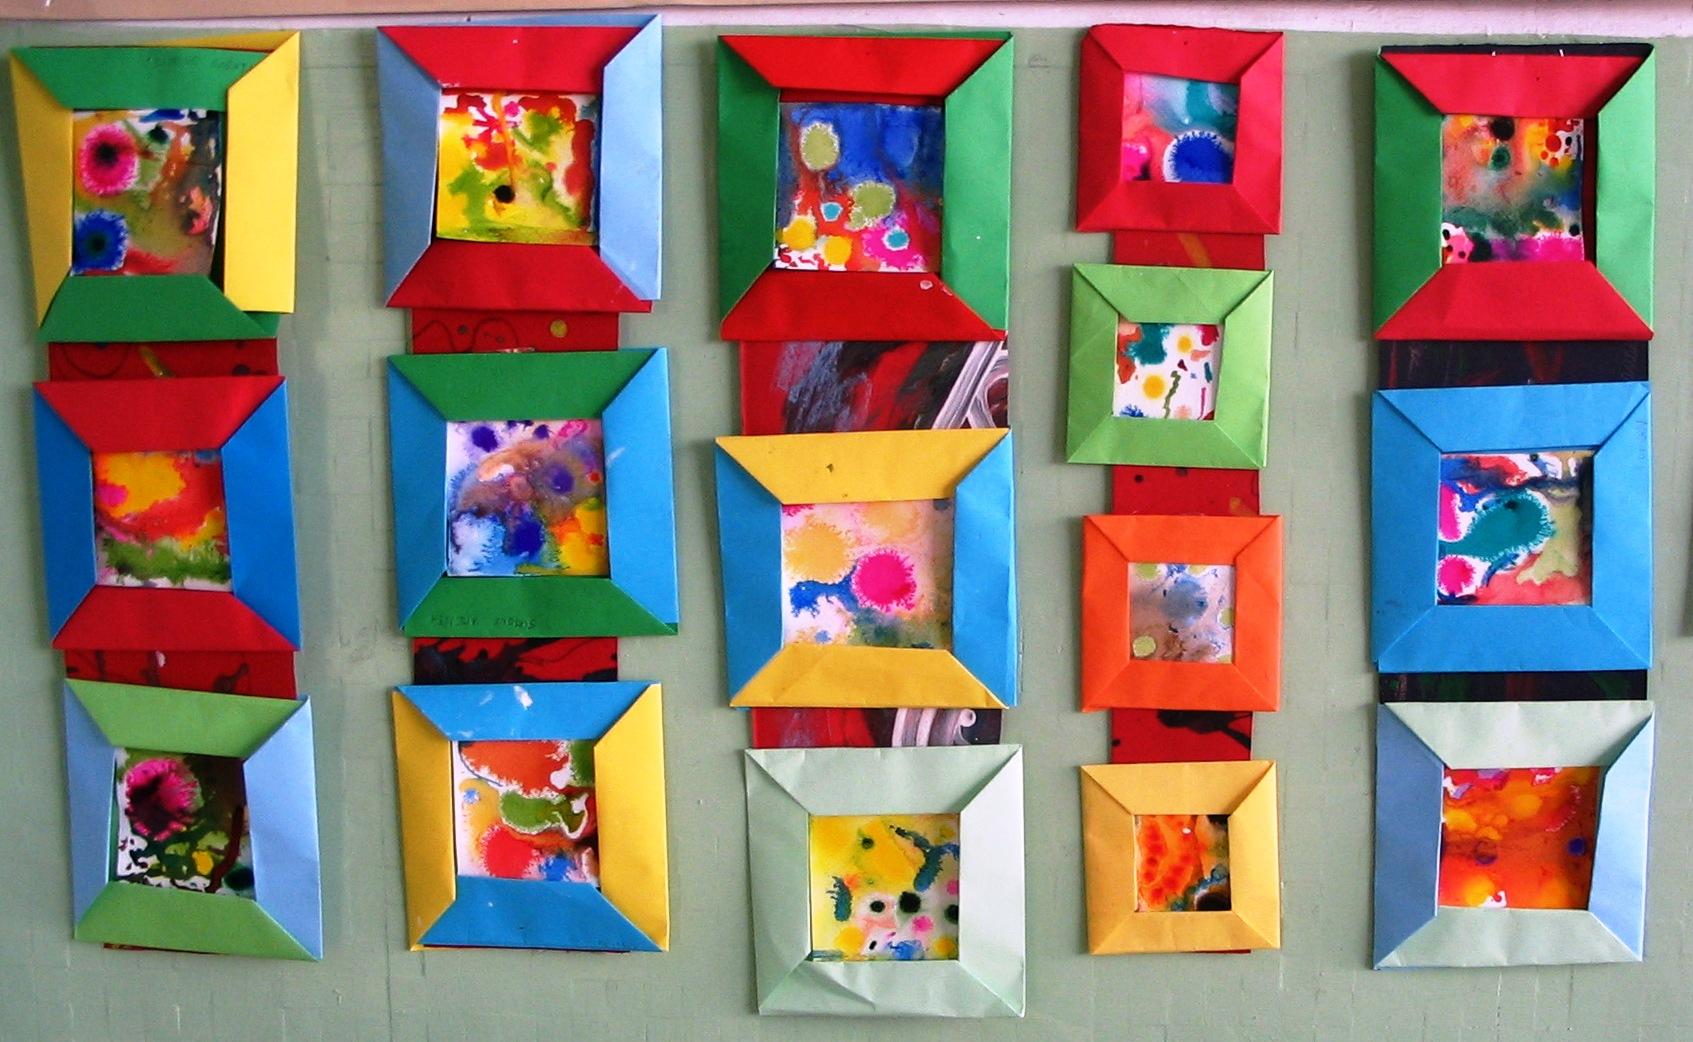 Cornici Colorate Per Foto cornici di carta per ogni occasione – prima parte | tina festa